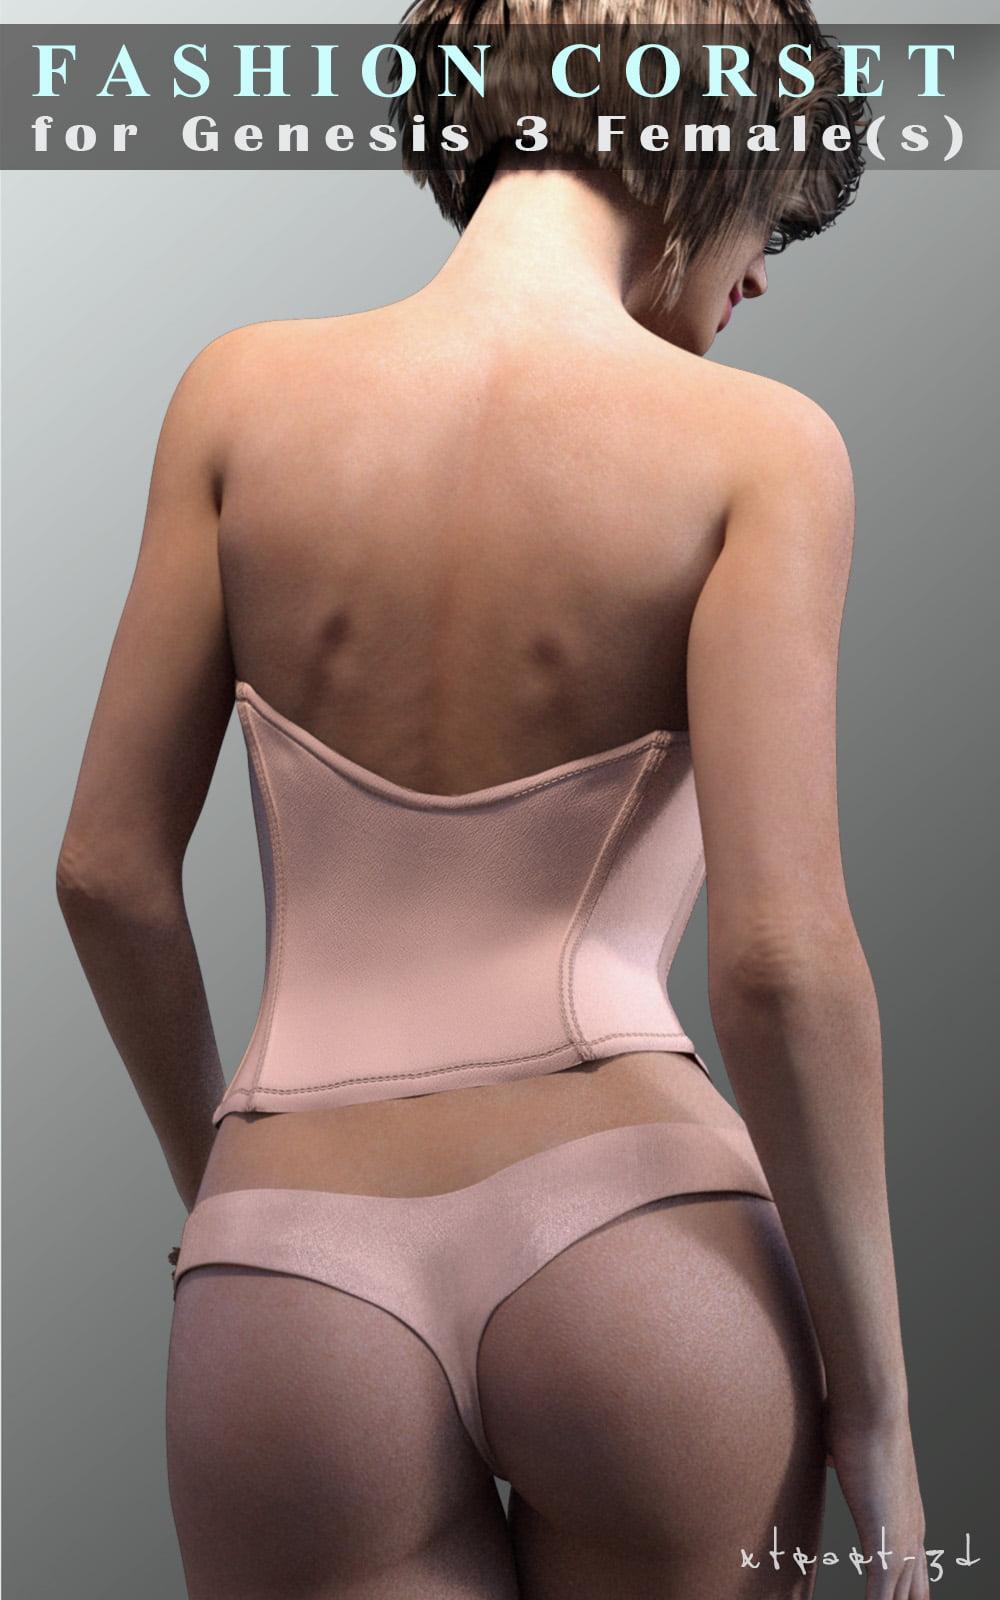 Fashion Corset for Genesis 3 Female